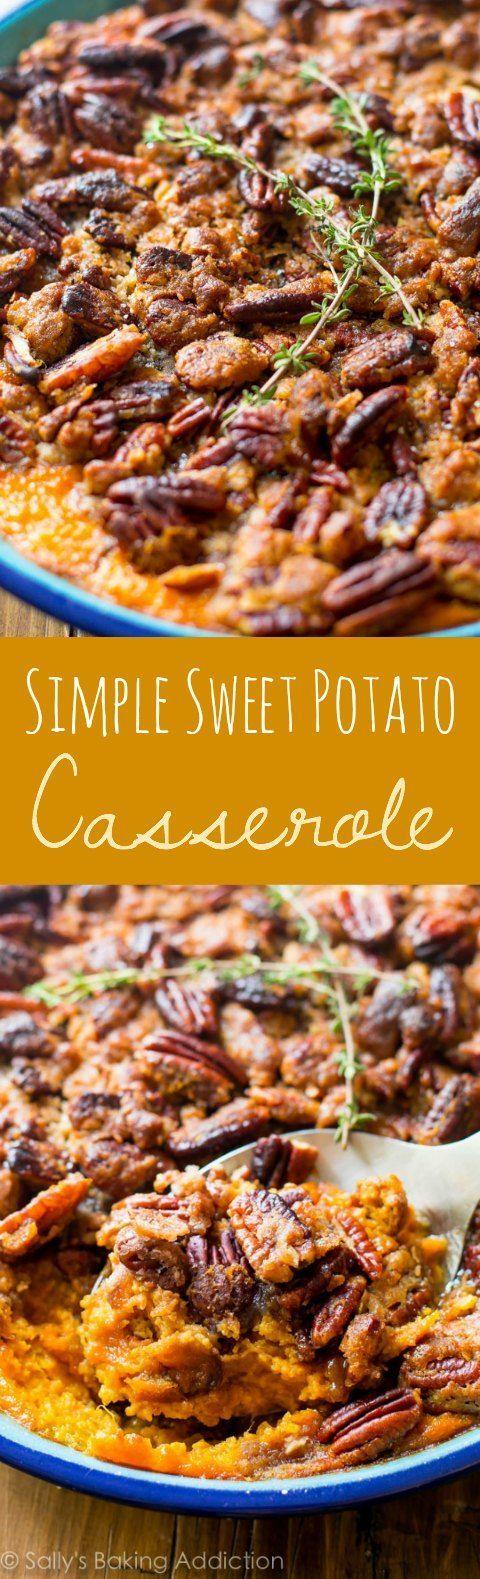 Vanilla buttery sweet potato mash underneath a crunchy, cinnamon, and brown sugar pecan crumble! What an easy make-ahead Thanksgiving side dish!